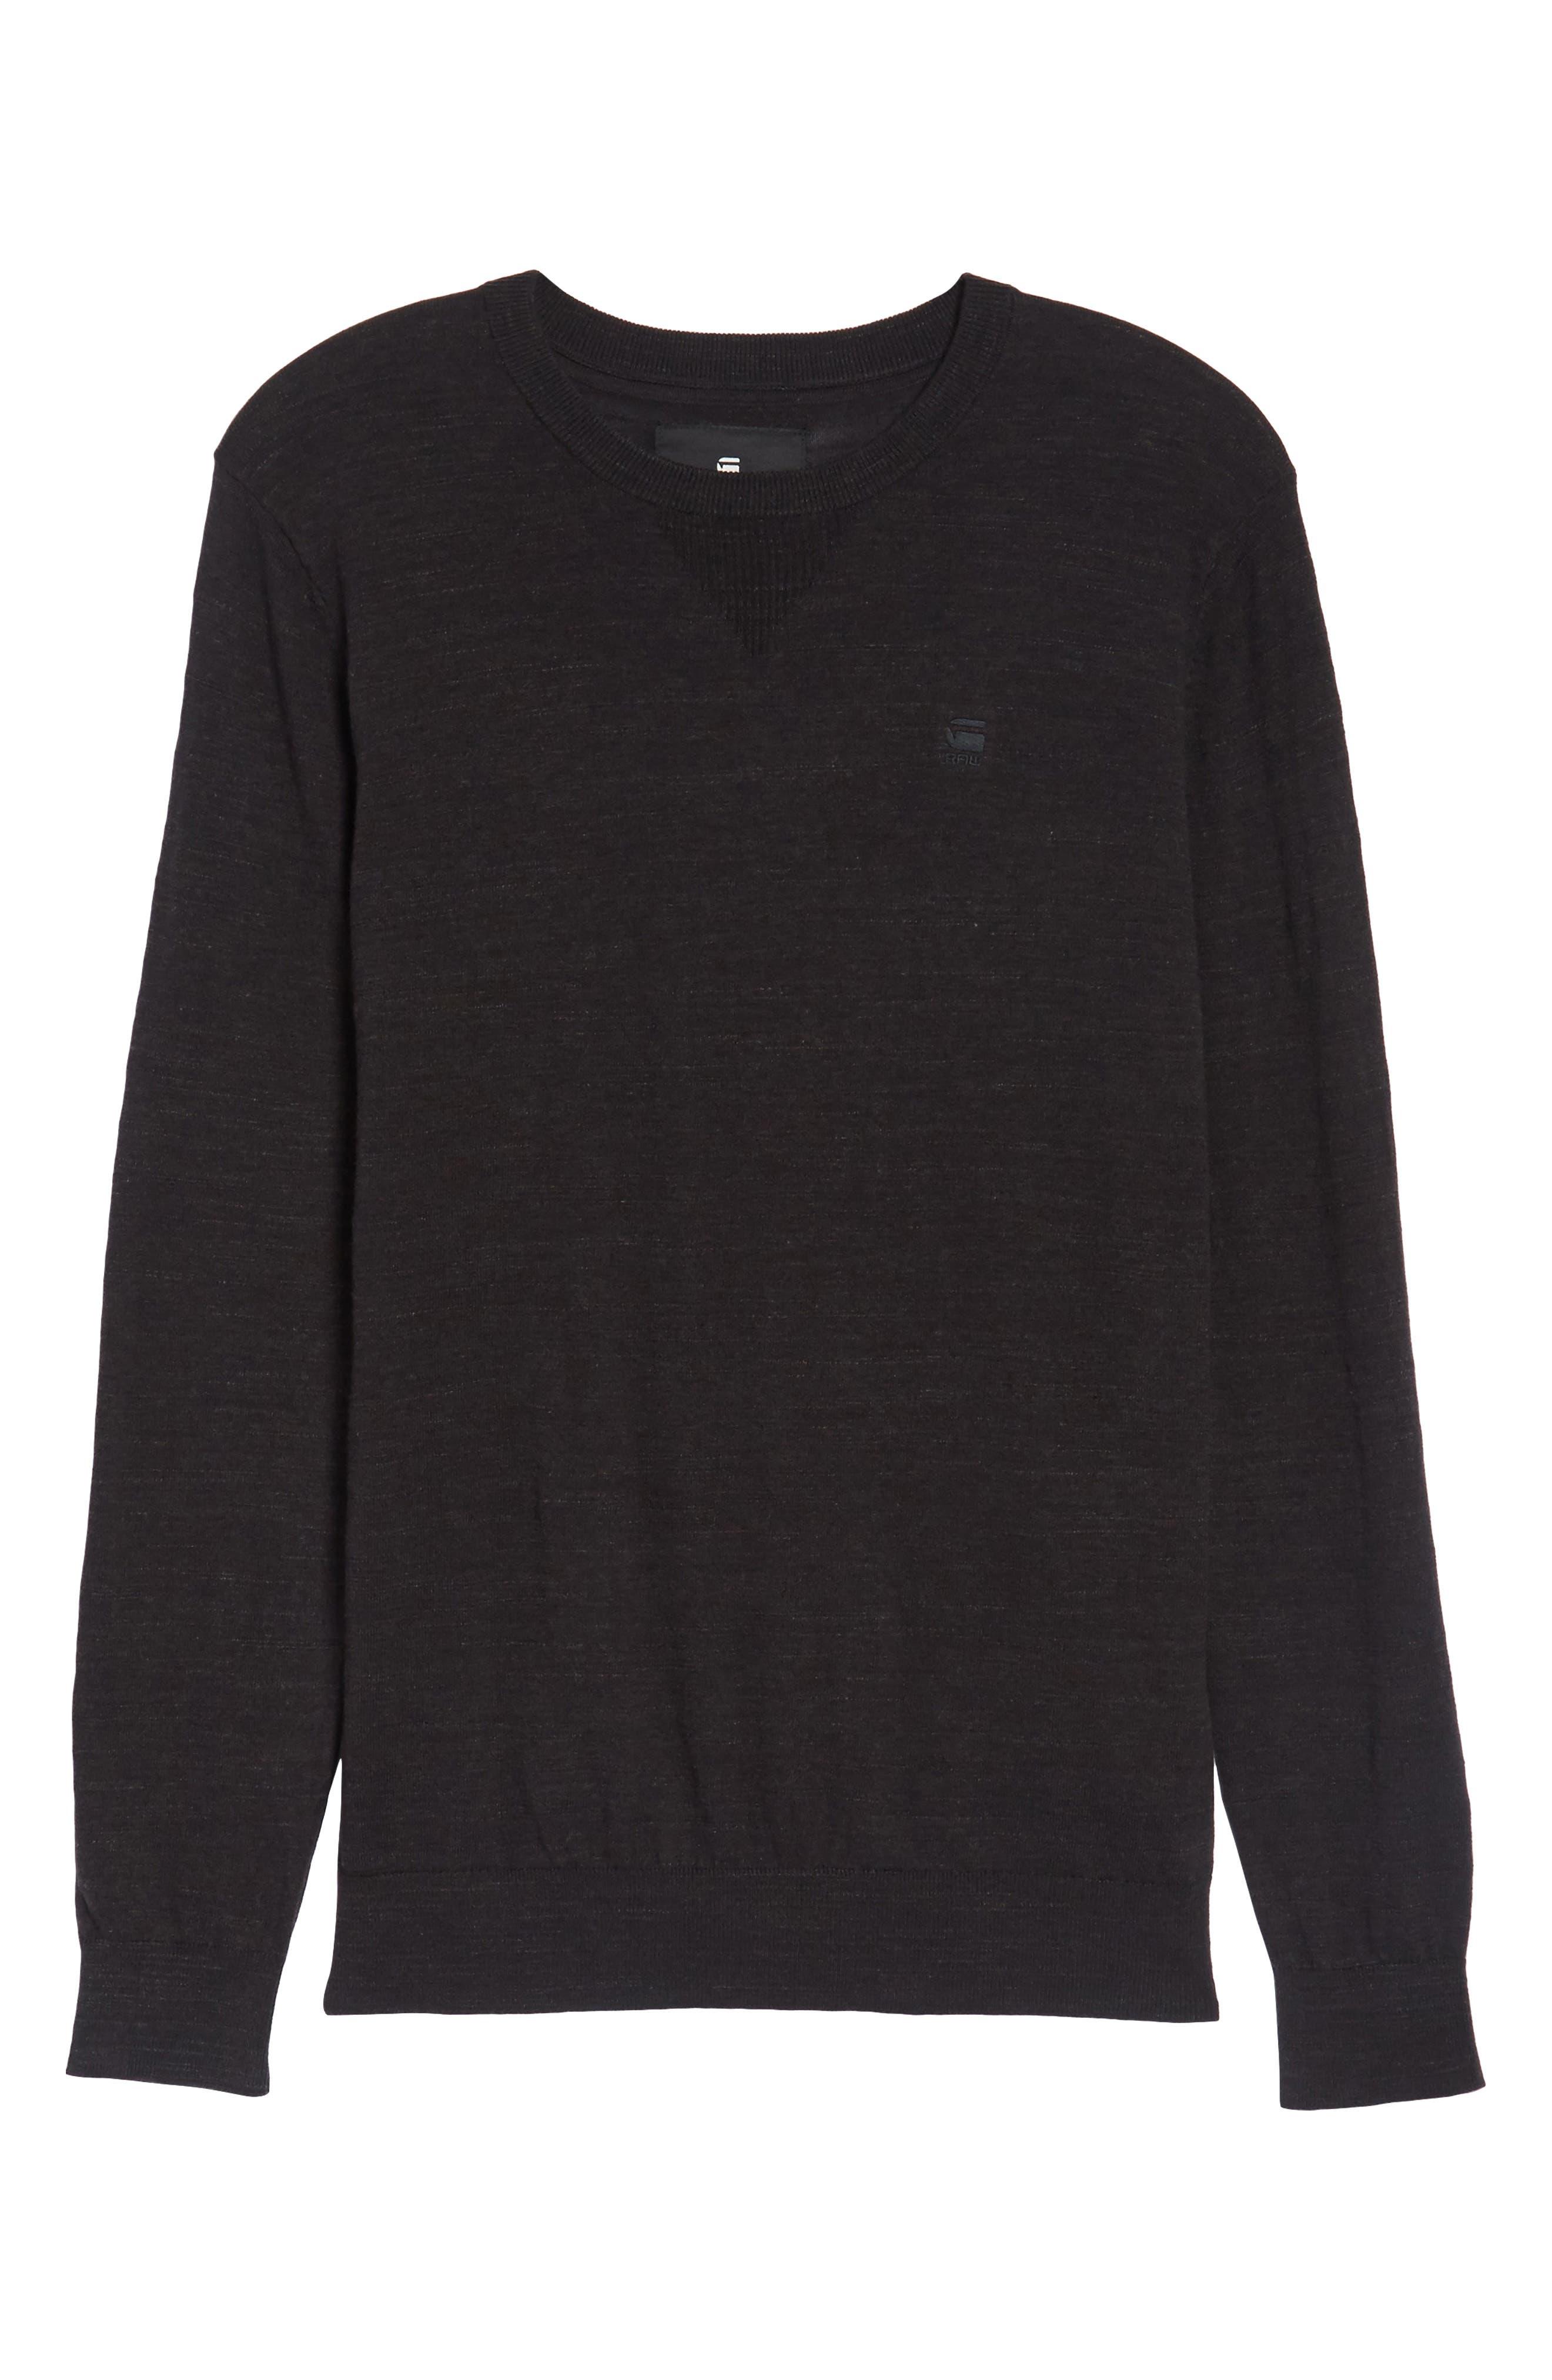 Core Sweater,                             Alternate thumbnail 6, color,                             001